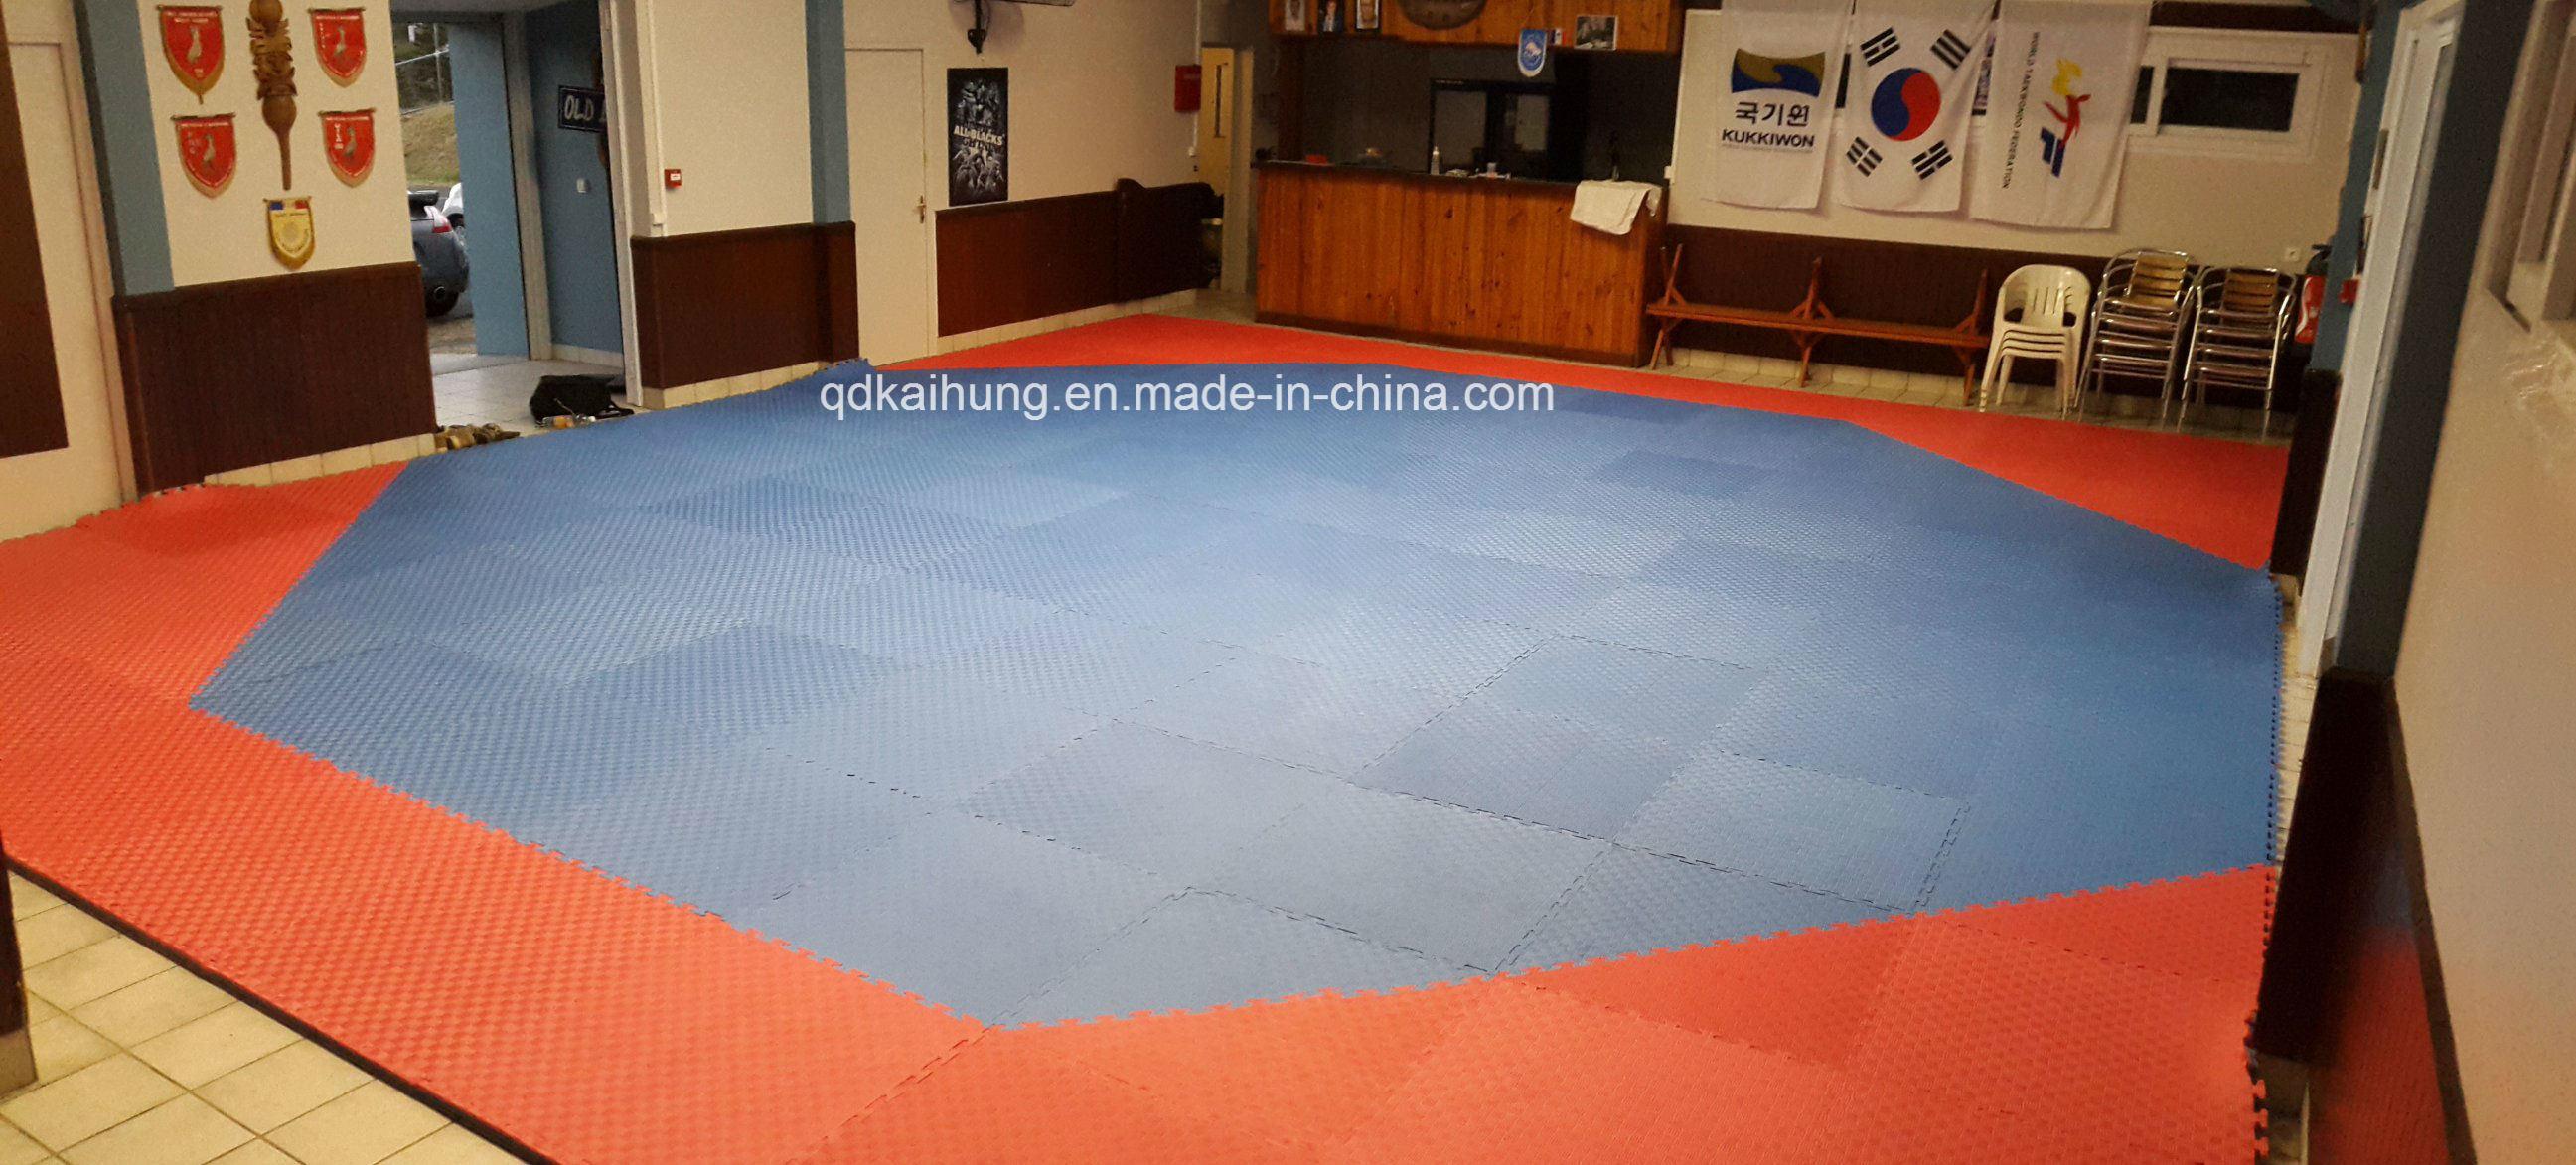 Octagonal Shape Martial Arts Floor Jigsaw Tatami Competition Mats